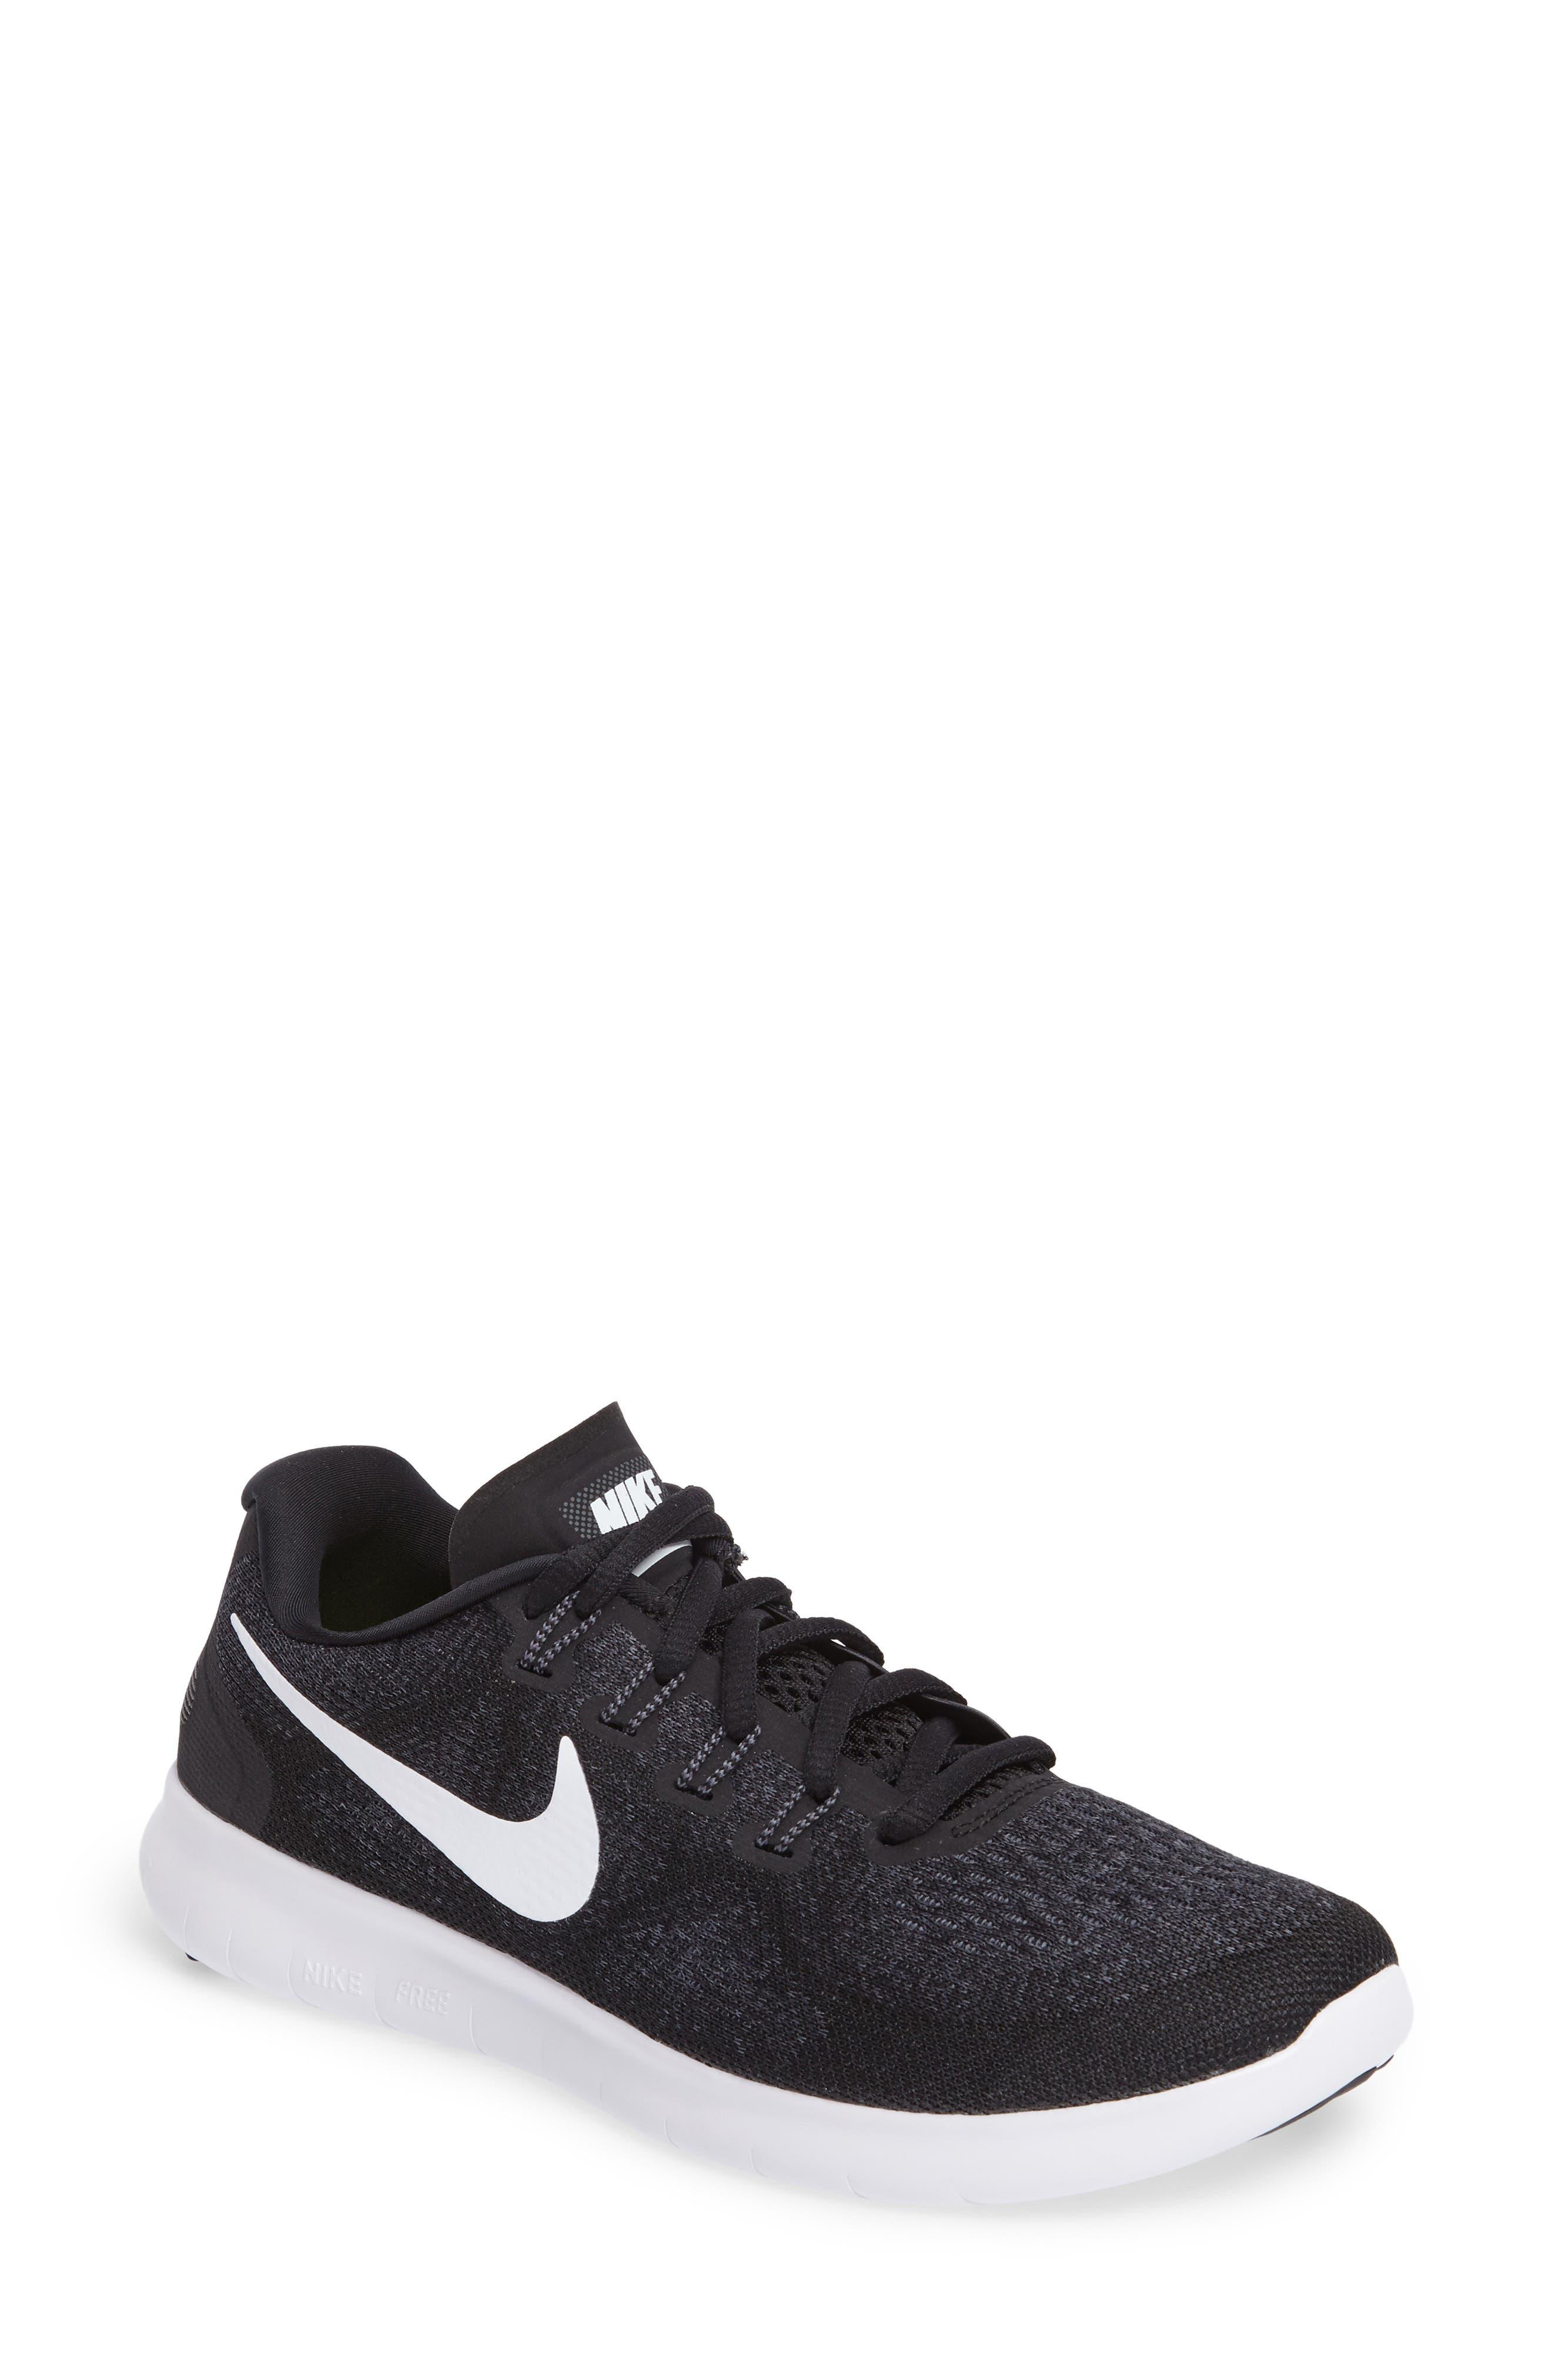 Free RN 2 Running Shoe,                             Main thumbnail 1, color,                             Black/ White/ Grey/ Anthracite